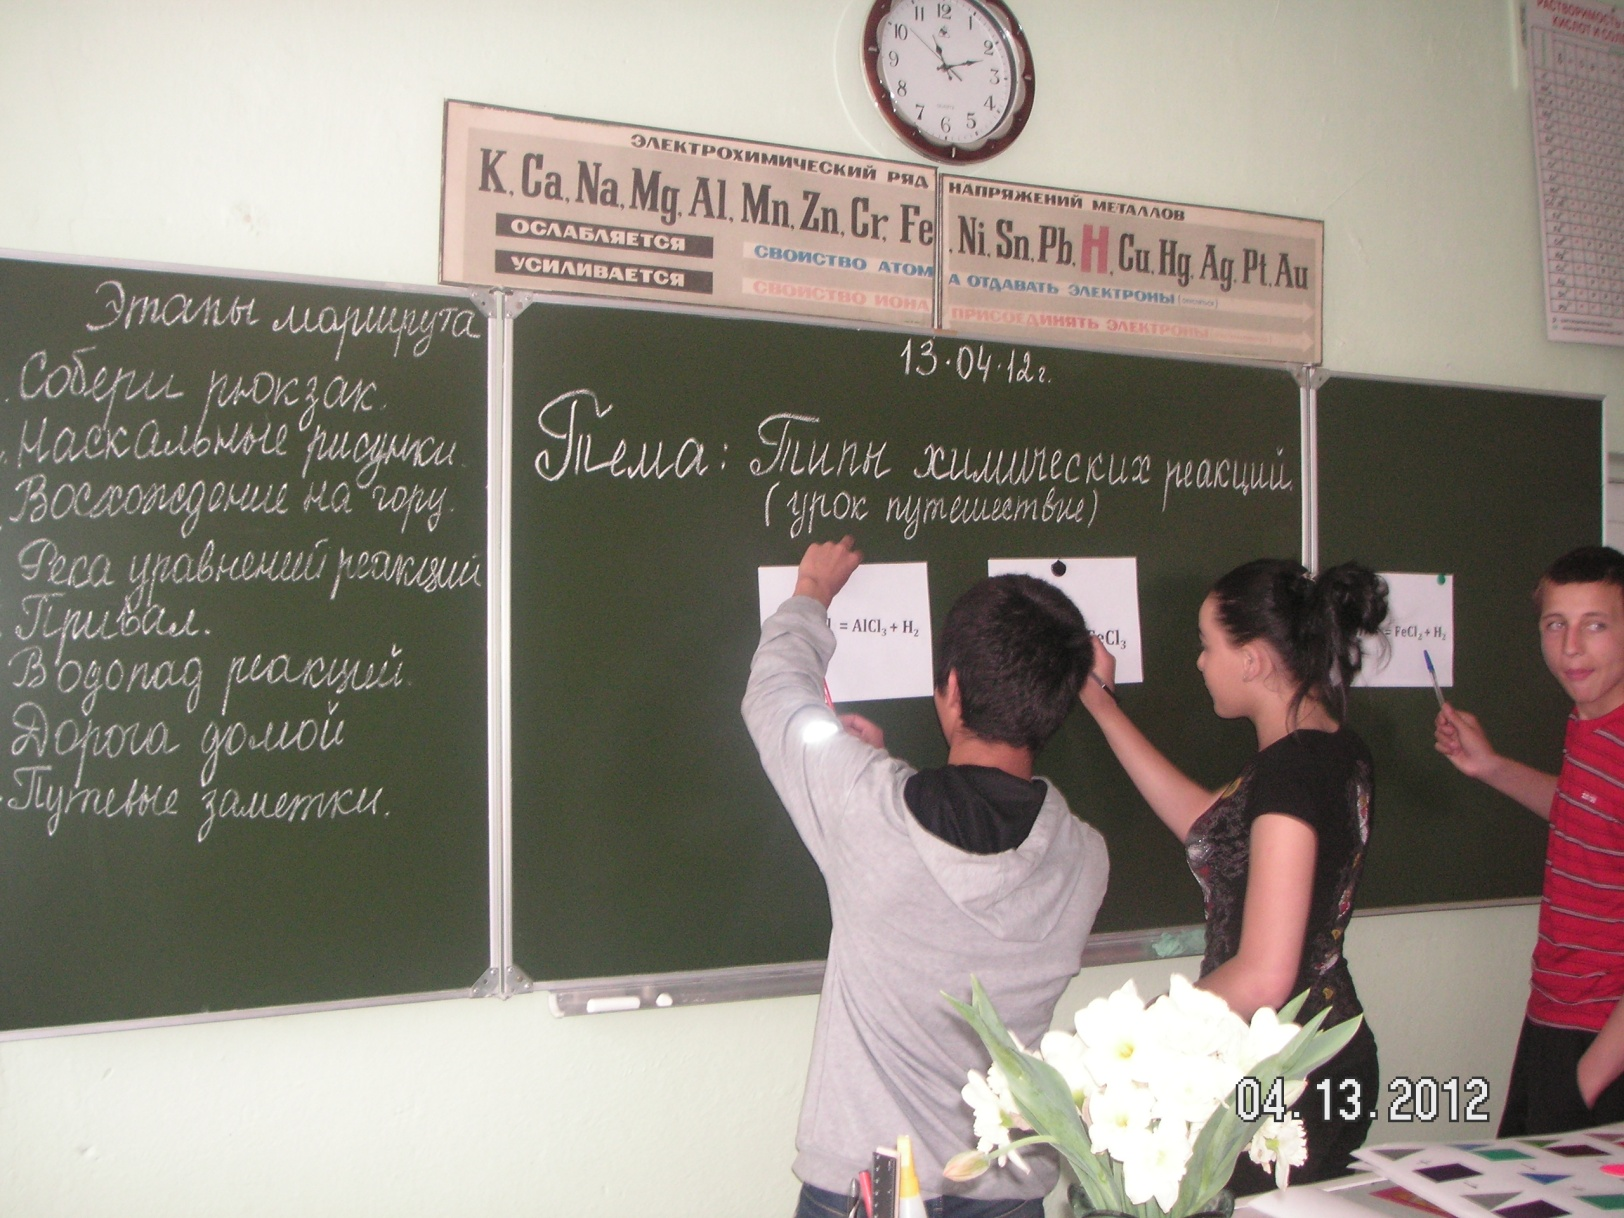 C:\Documents and Settings\123\Рабочий стол\Фото откр.урок\открытый урок 075.jpg